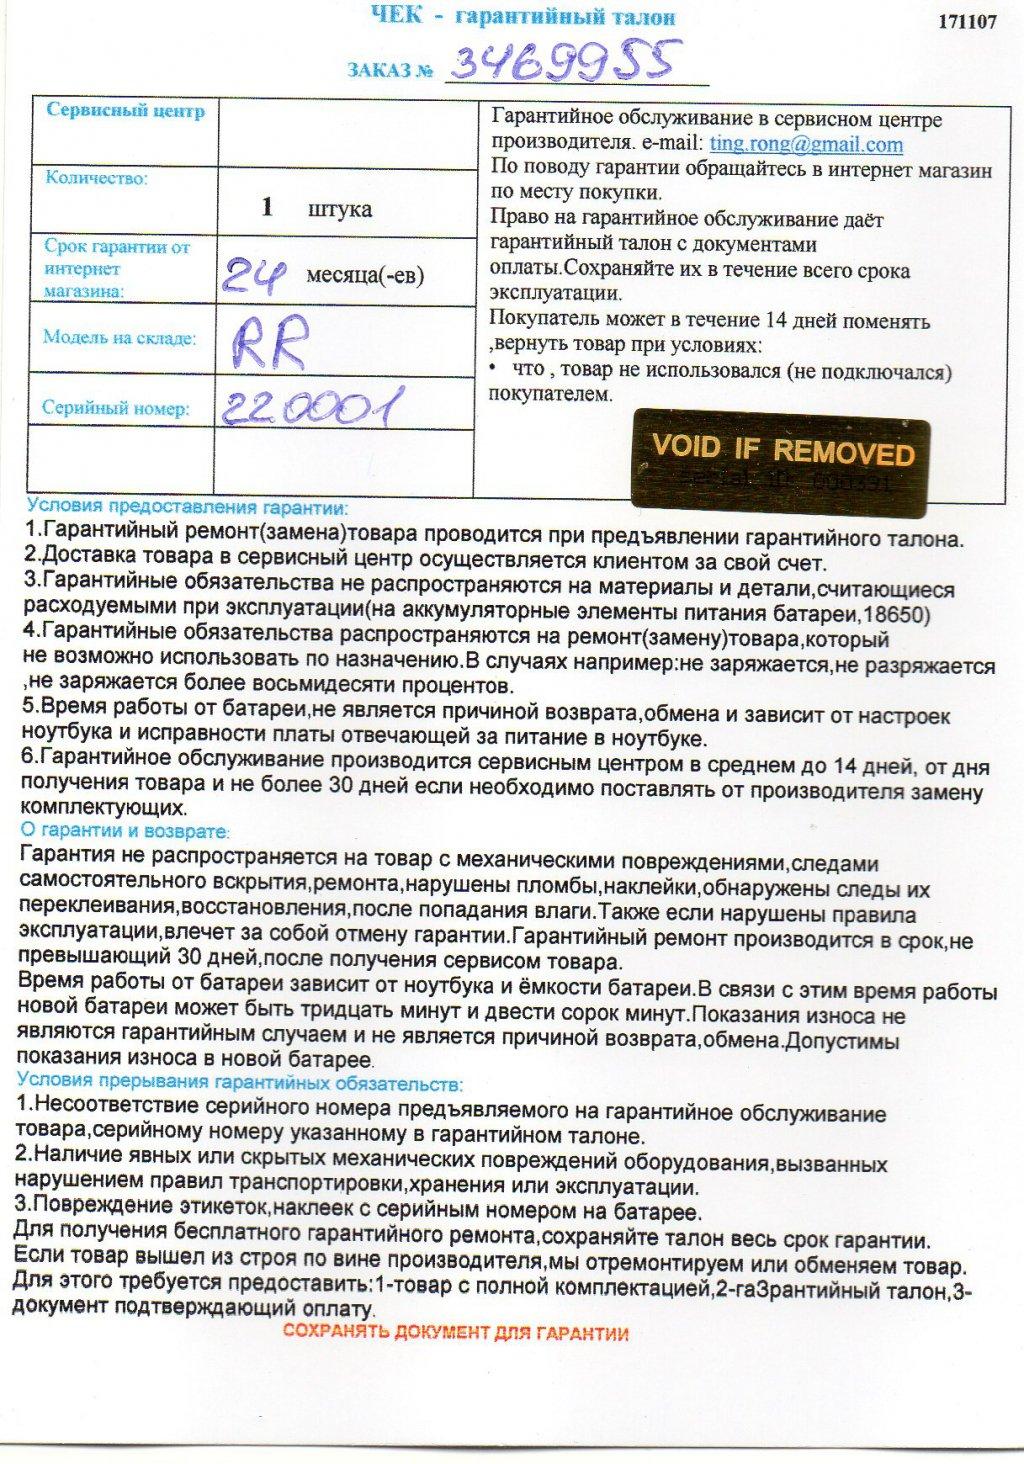 Интернет-магазин changebattery.com.ua - Changebattery отзывы